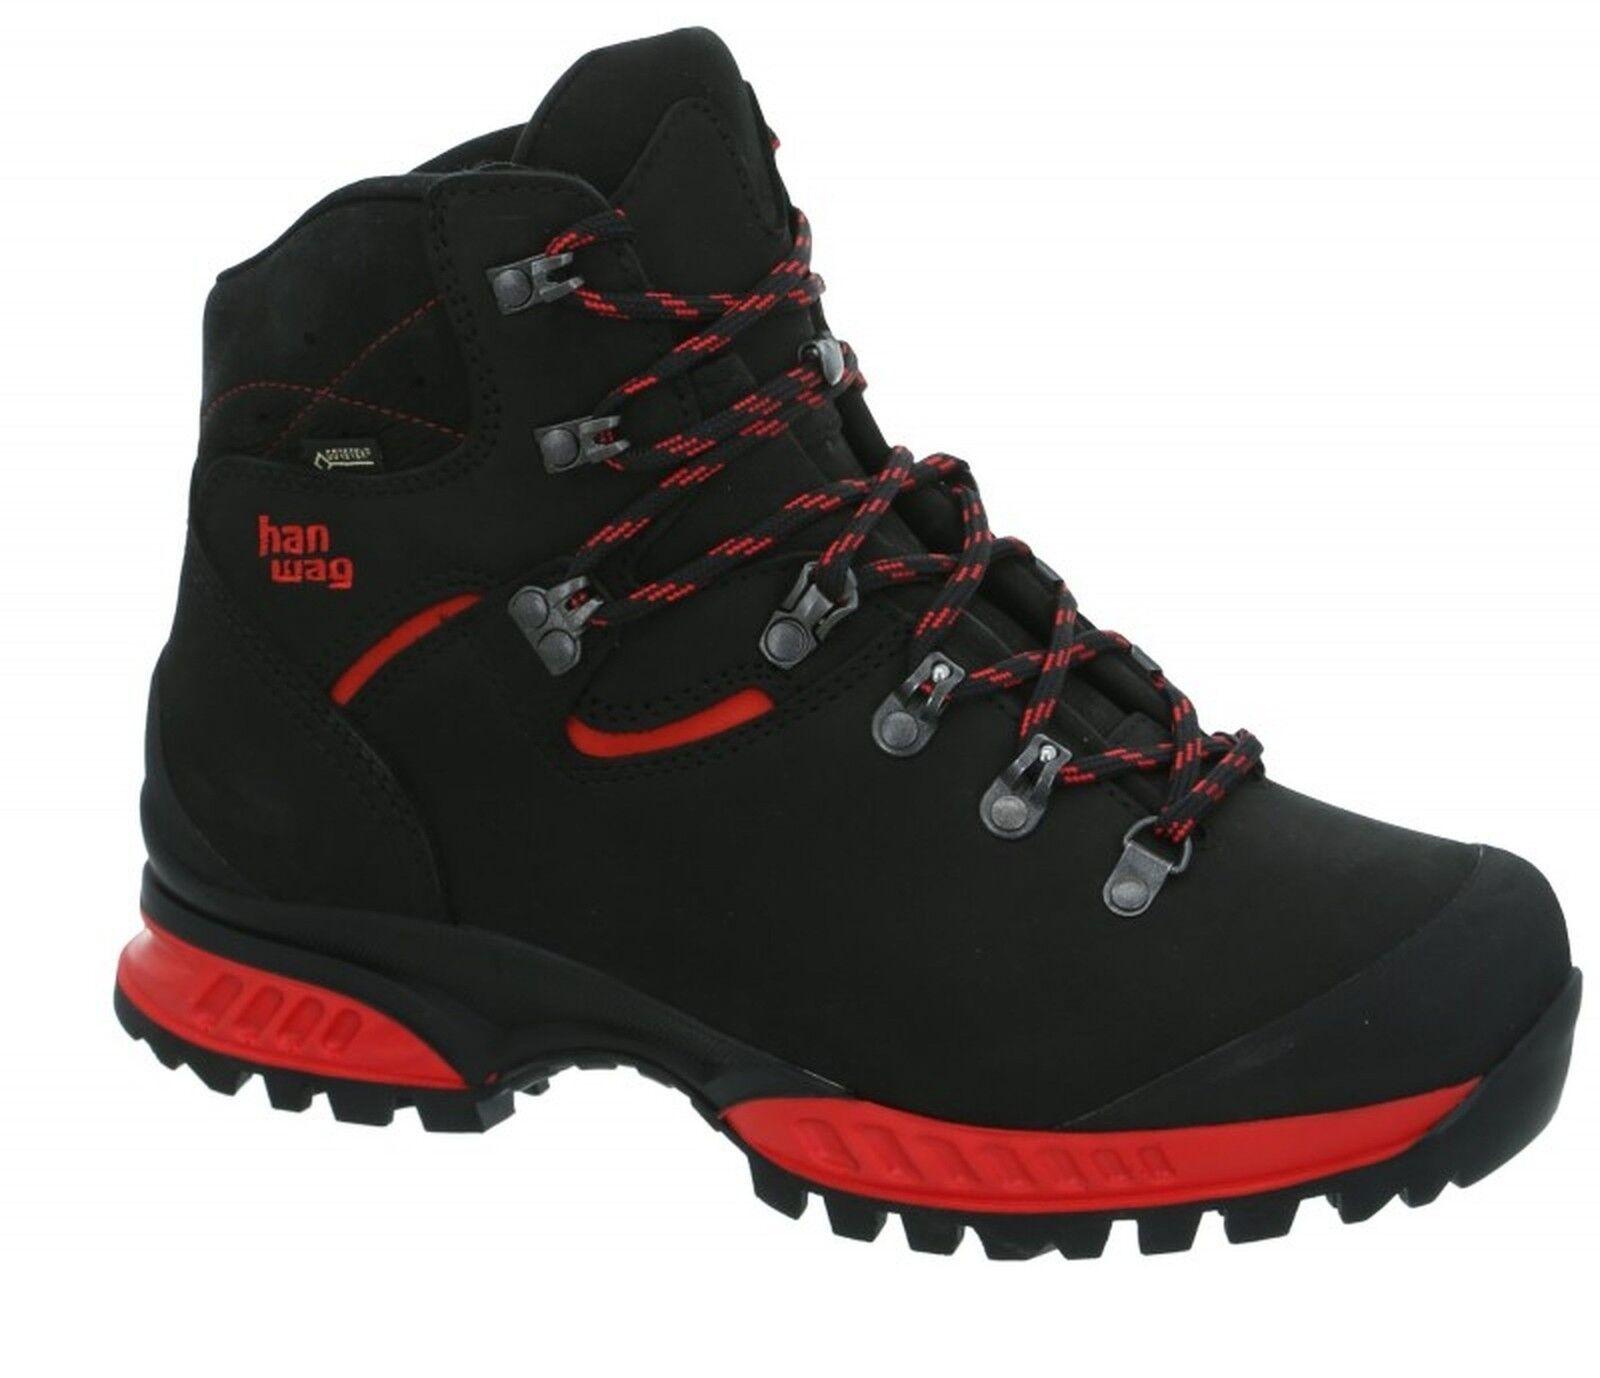 Hanwag Zapatos de Montaña Tatra II GTX Tamaño 10,5-45 Negro-Rojo